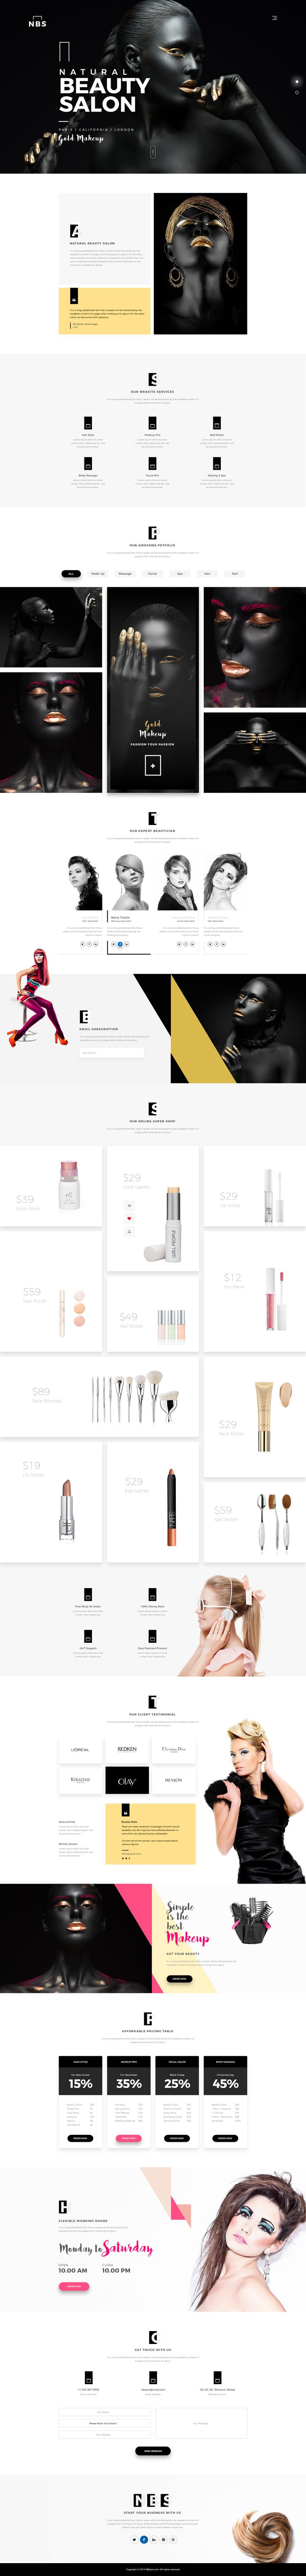 Natural Beauty Salon #salon #sauna #skin • Download ➝ https://themeforest.net/item/natural-beauty-salon/19207848?ref=pxcr